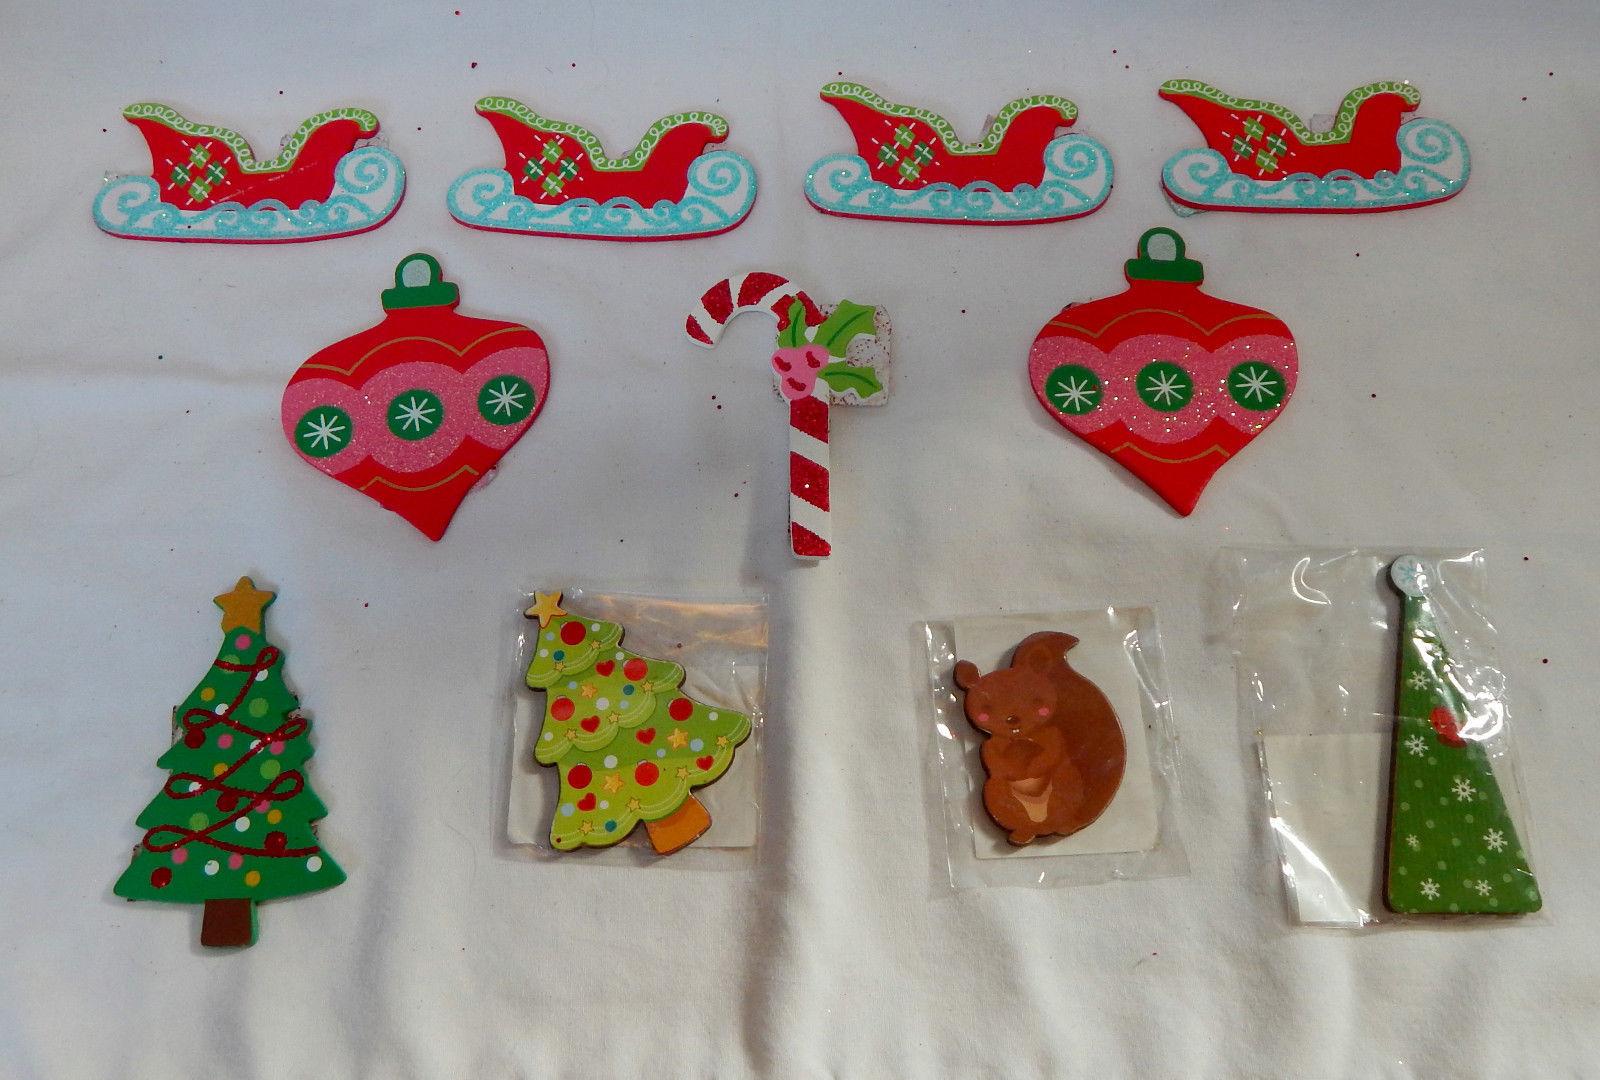 Michaels Craft Store Christmas Decorations Ezvkbd Newyear2020blog Site